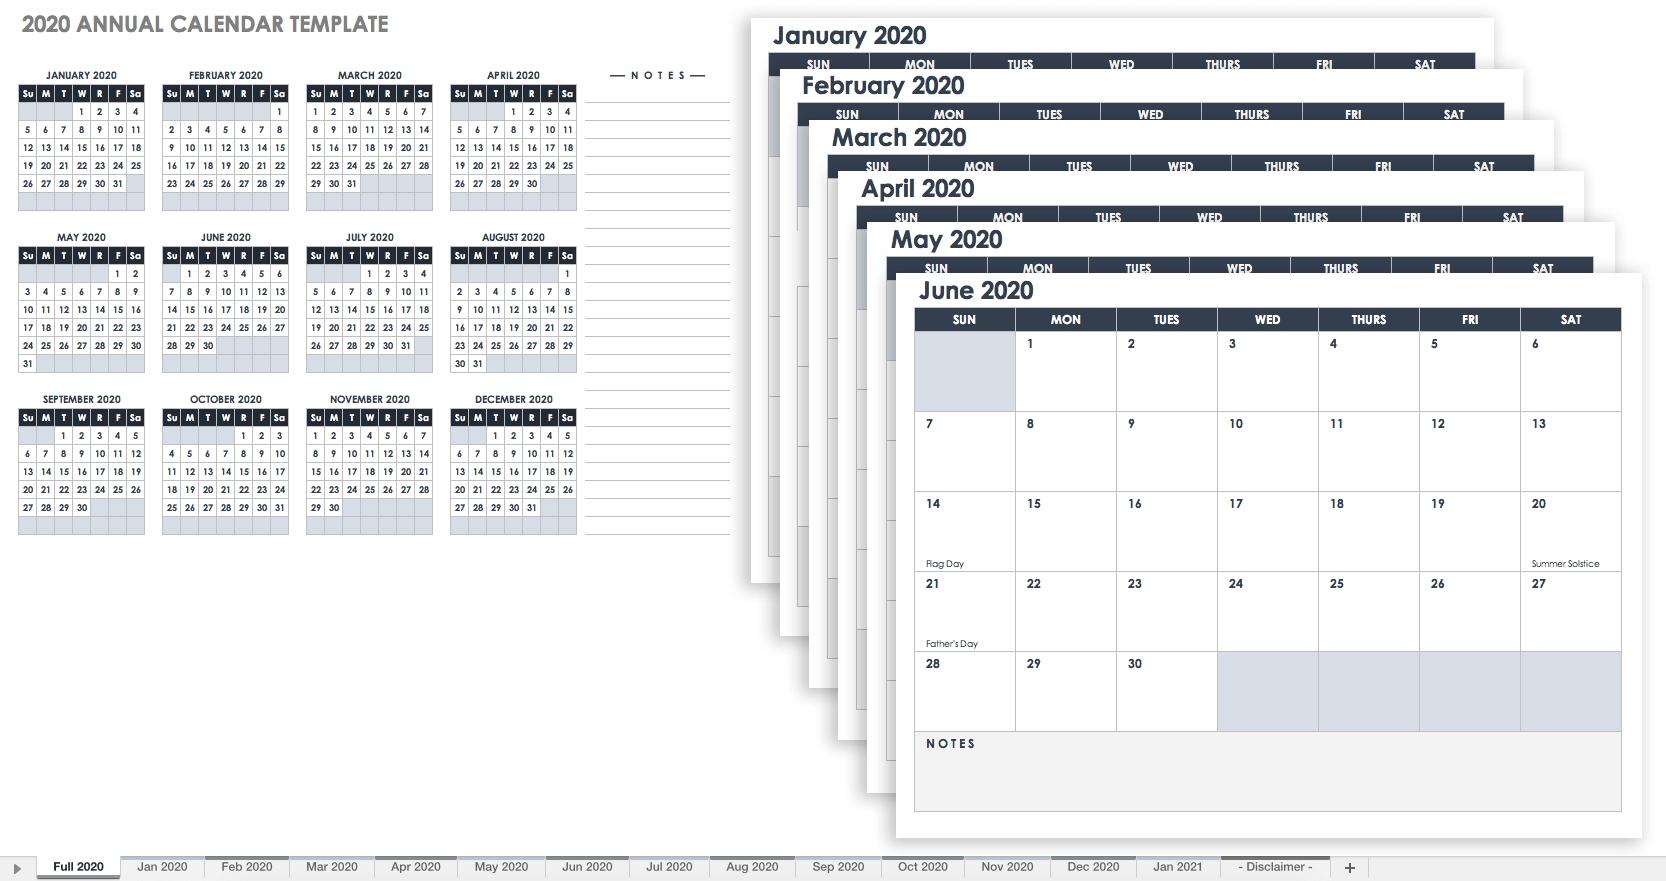 Free Blank Calendar Templates - Smartsheet  31 Day Month Calendar Printable